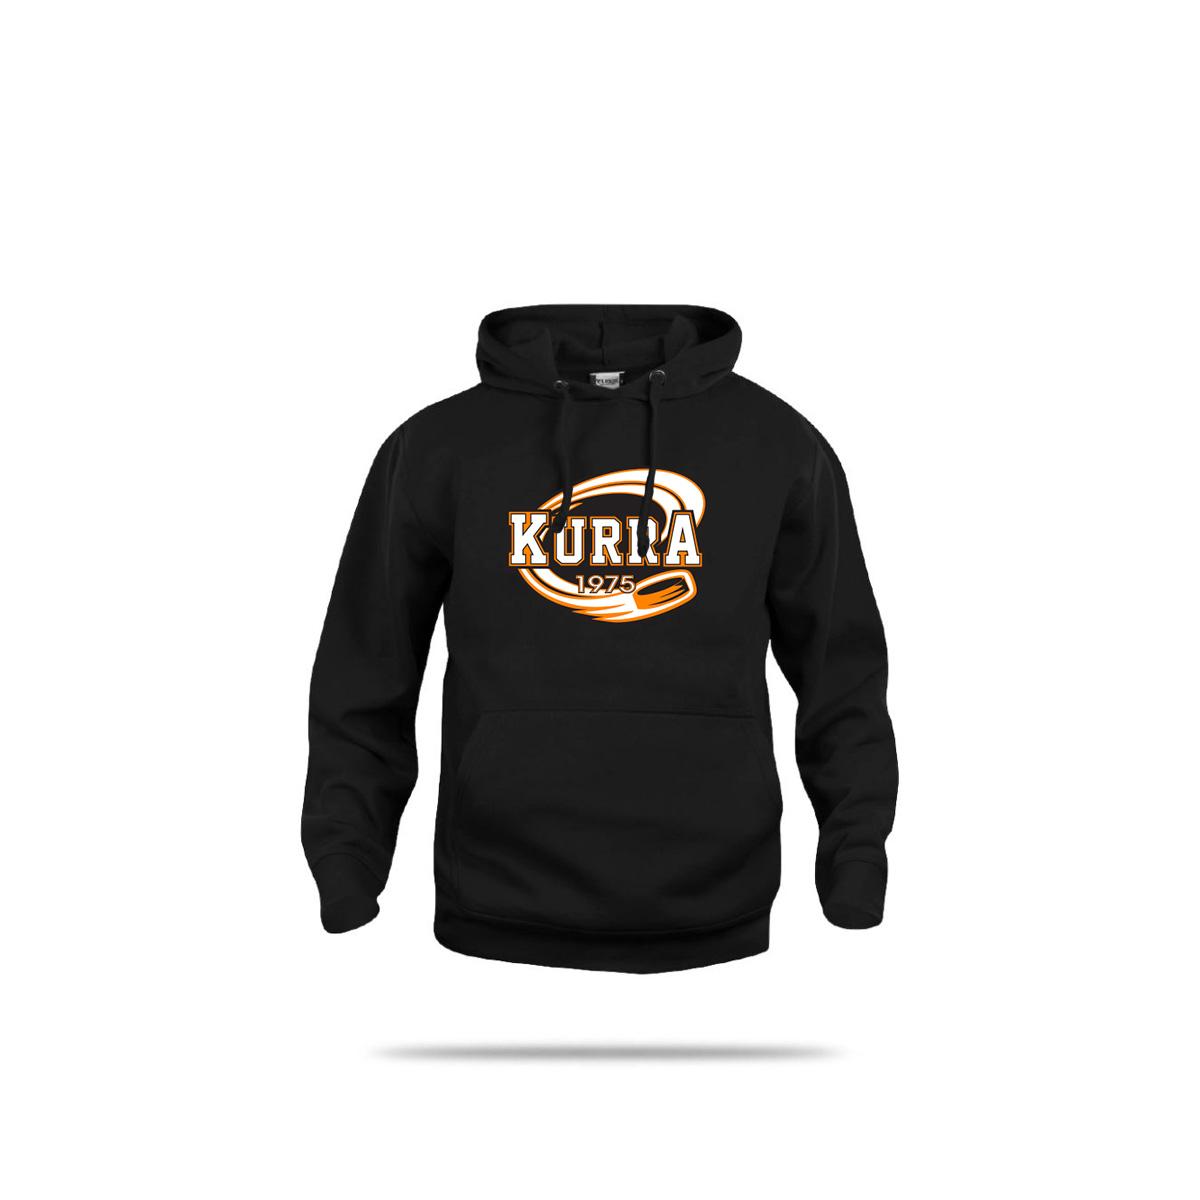 Kurra-Original-3026-musta